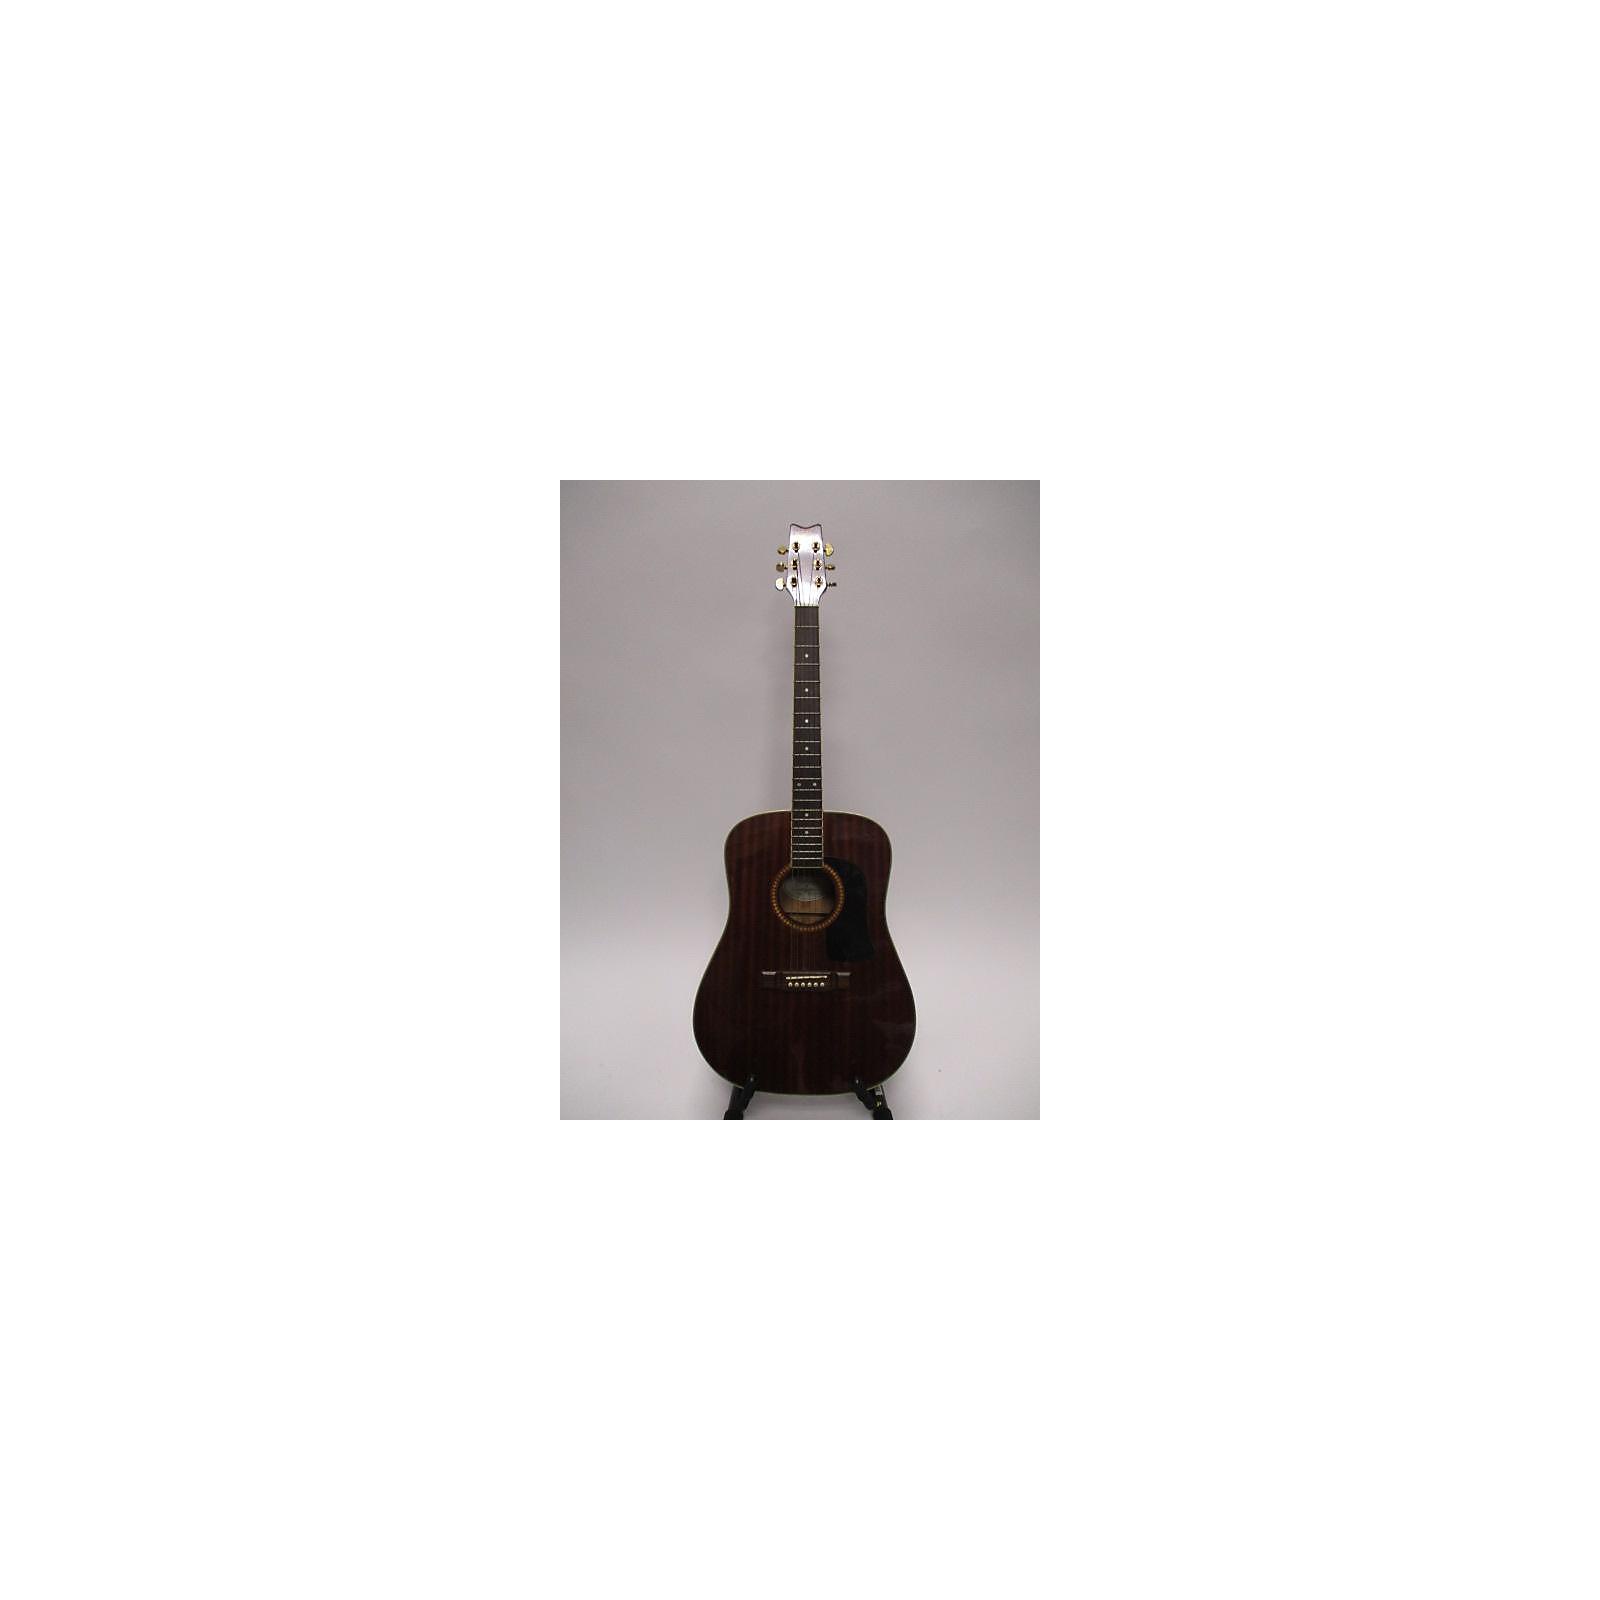 Washburn D 100M Acoustic Guitar